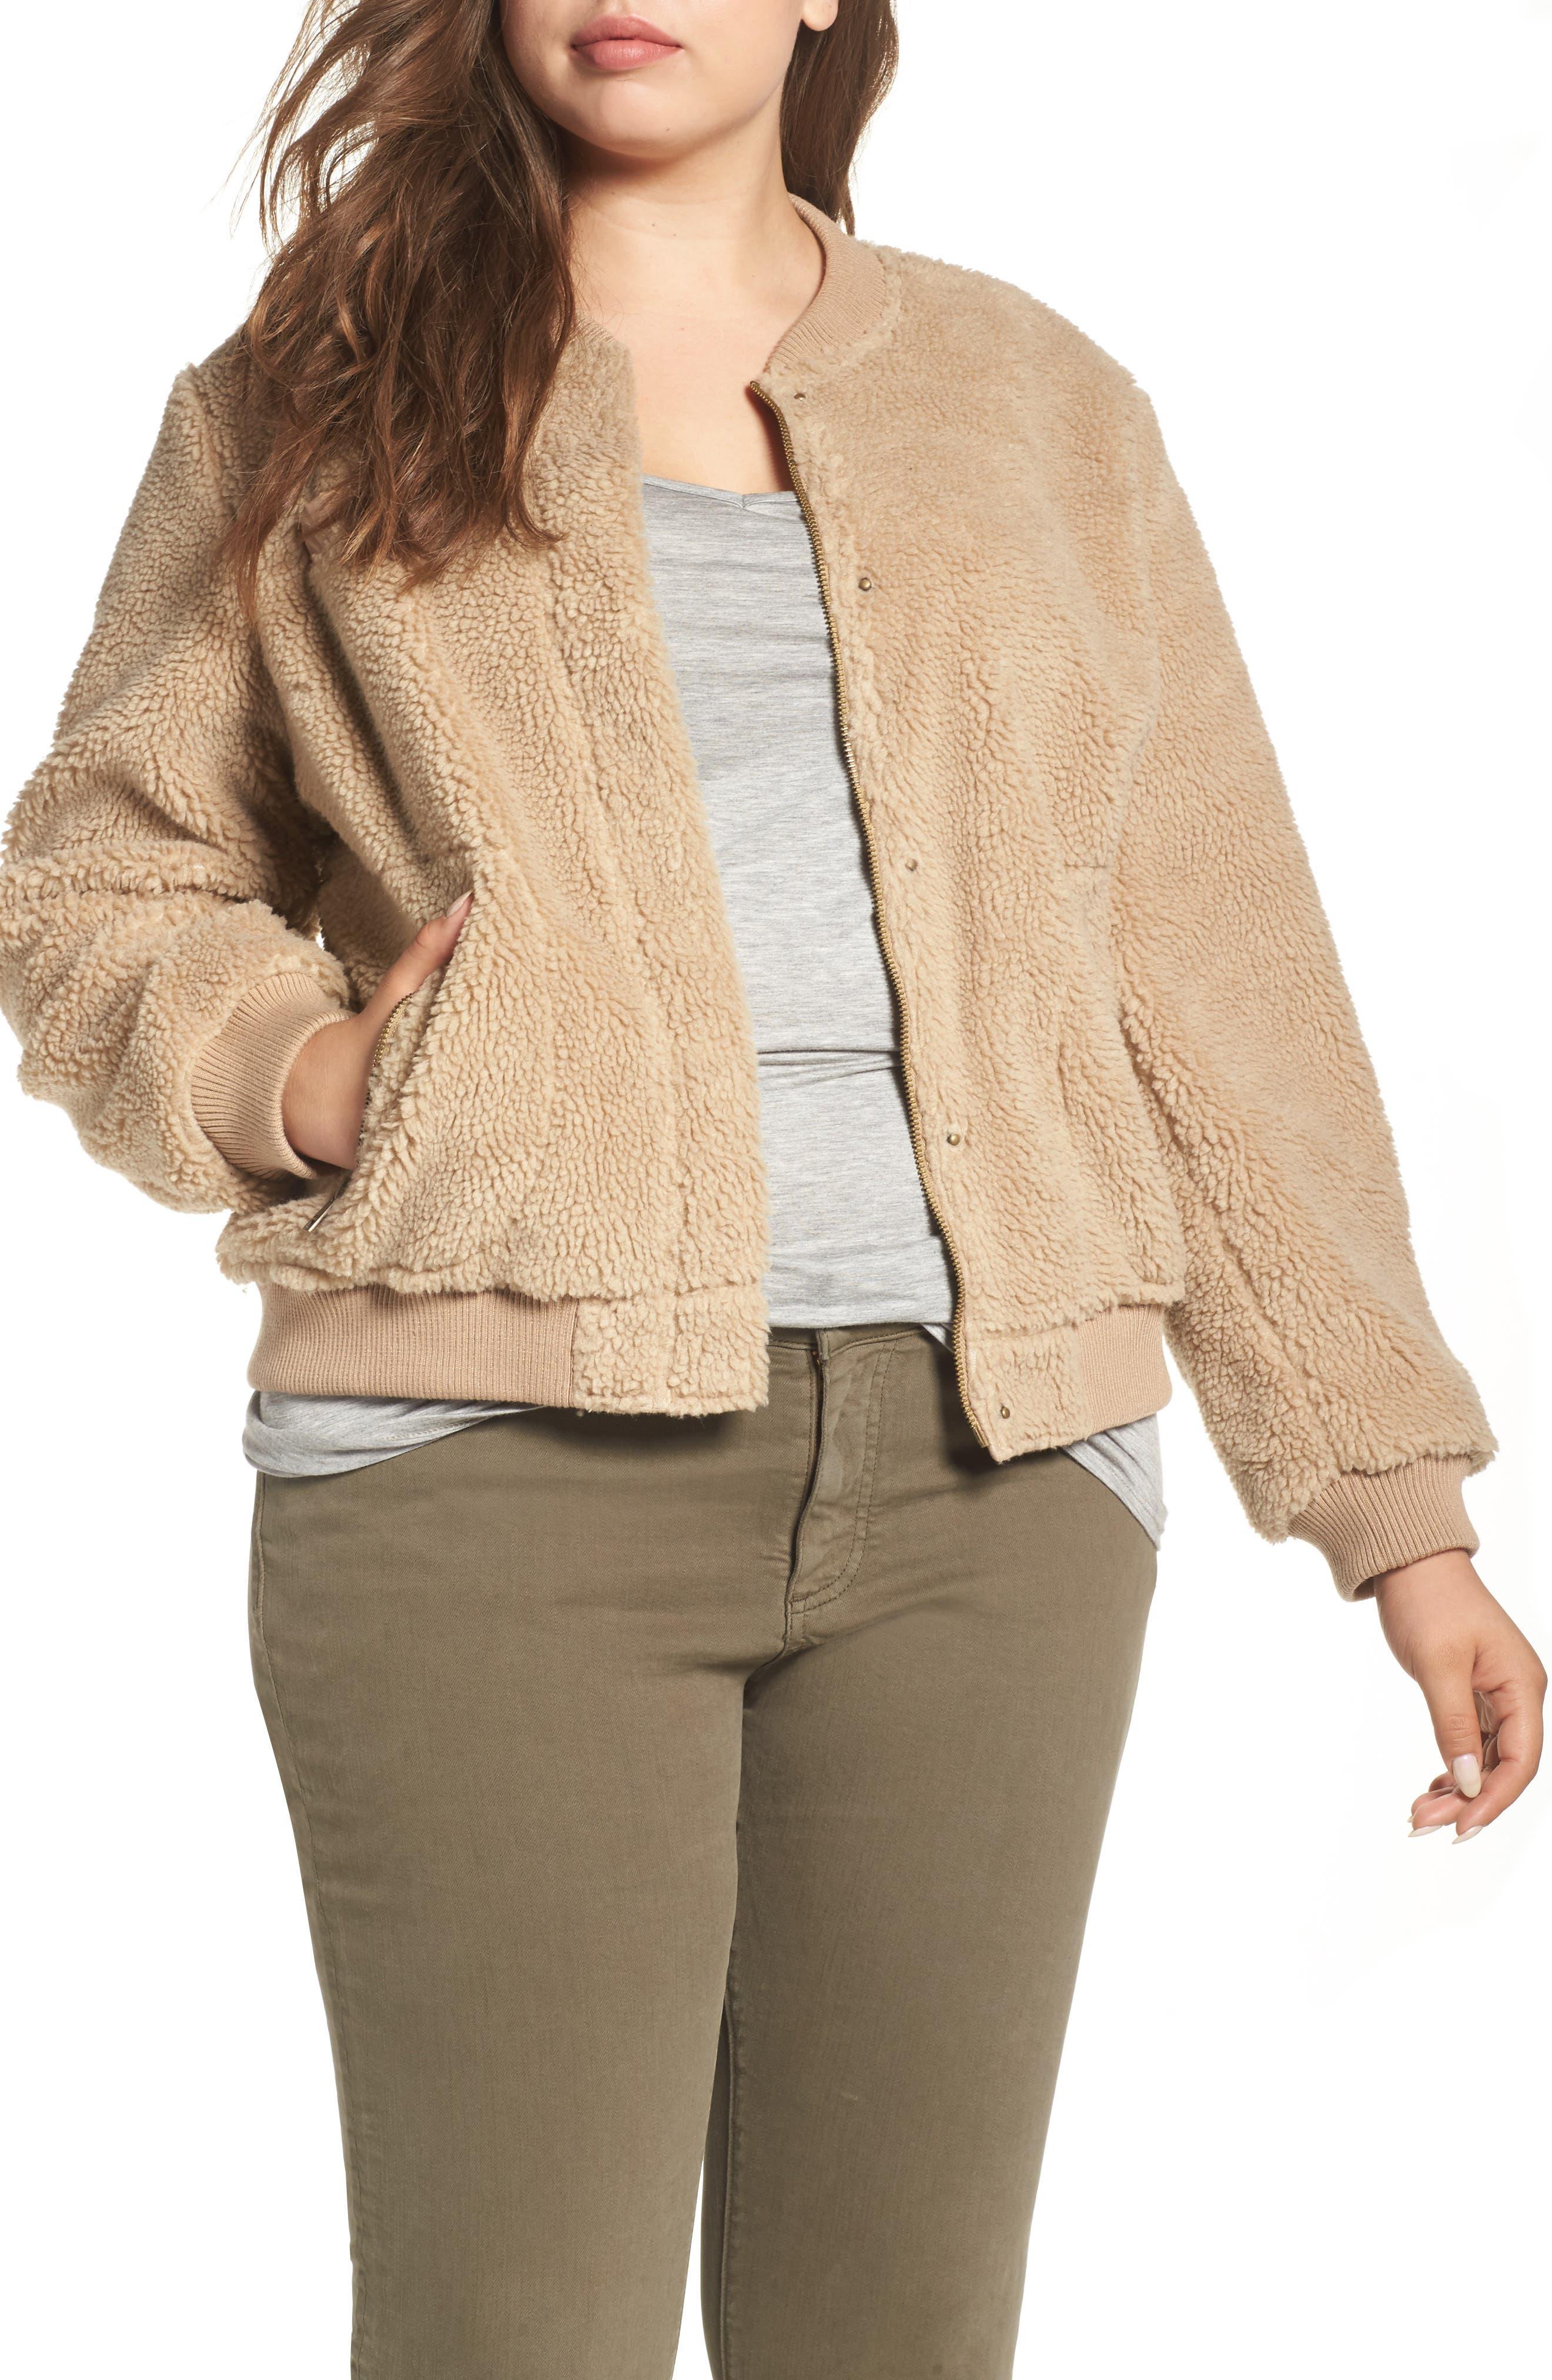 Main Image - Levi's® Rib Knit Fleece Bomber Jacket